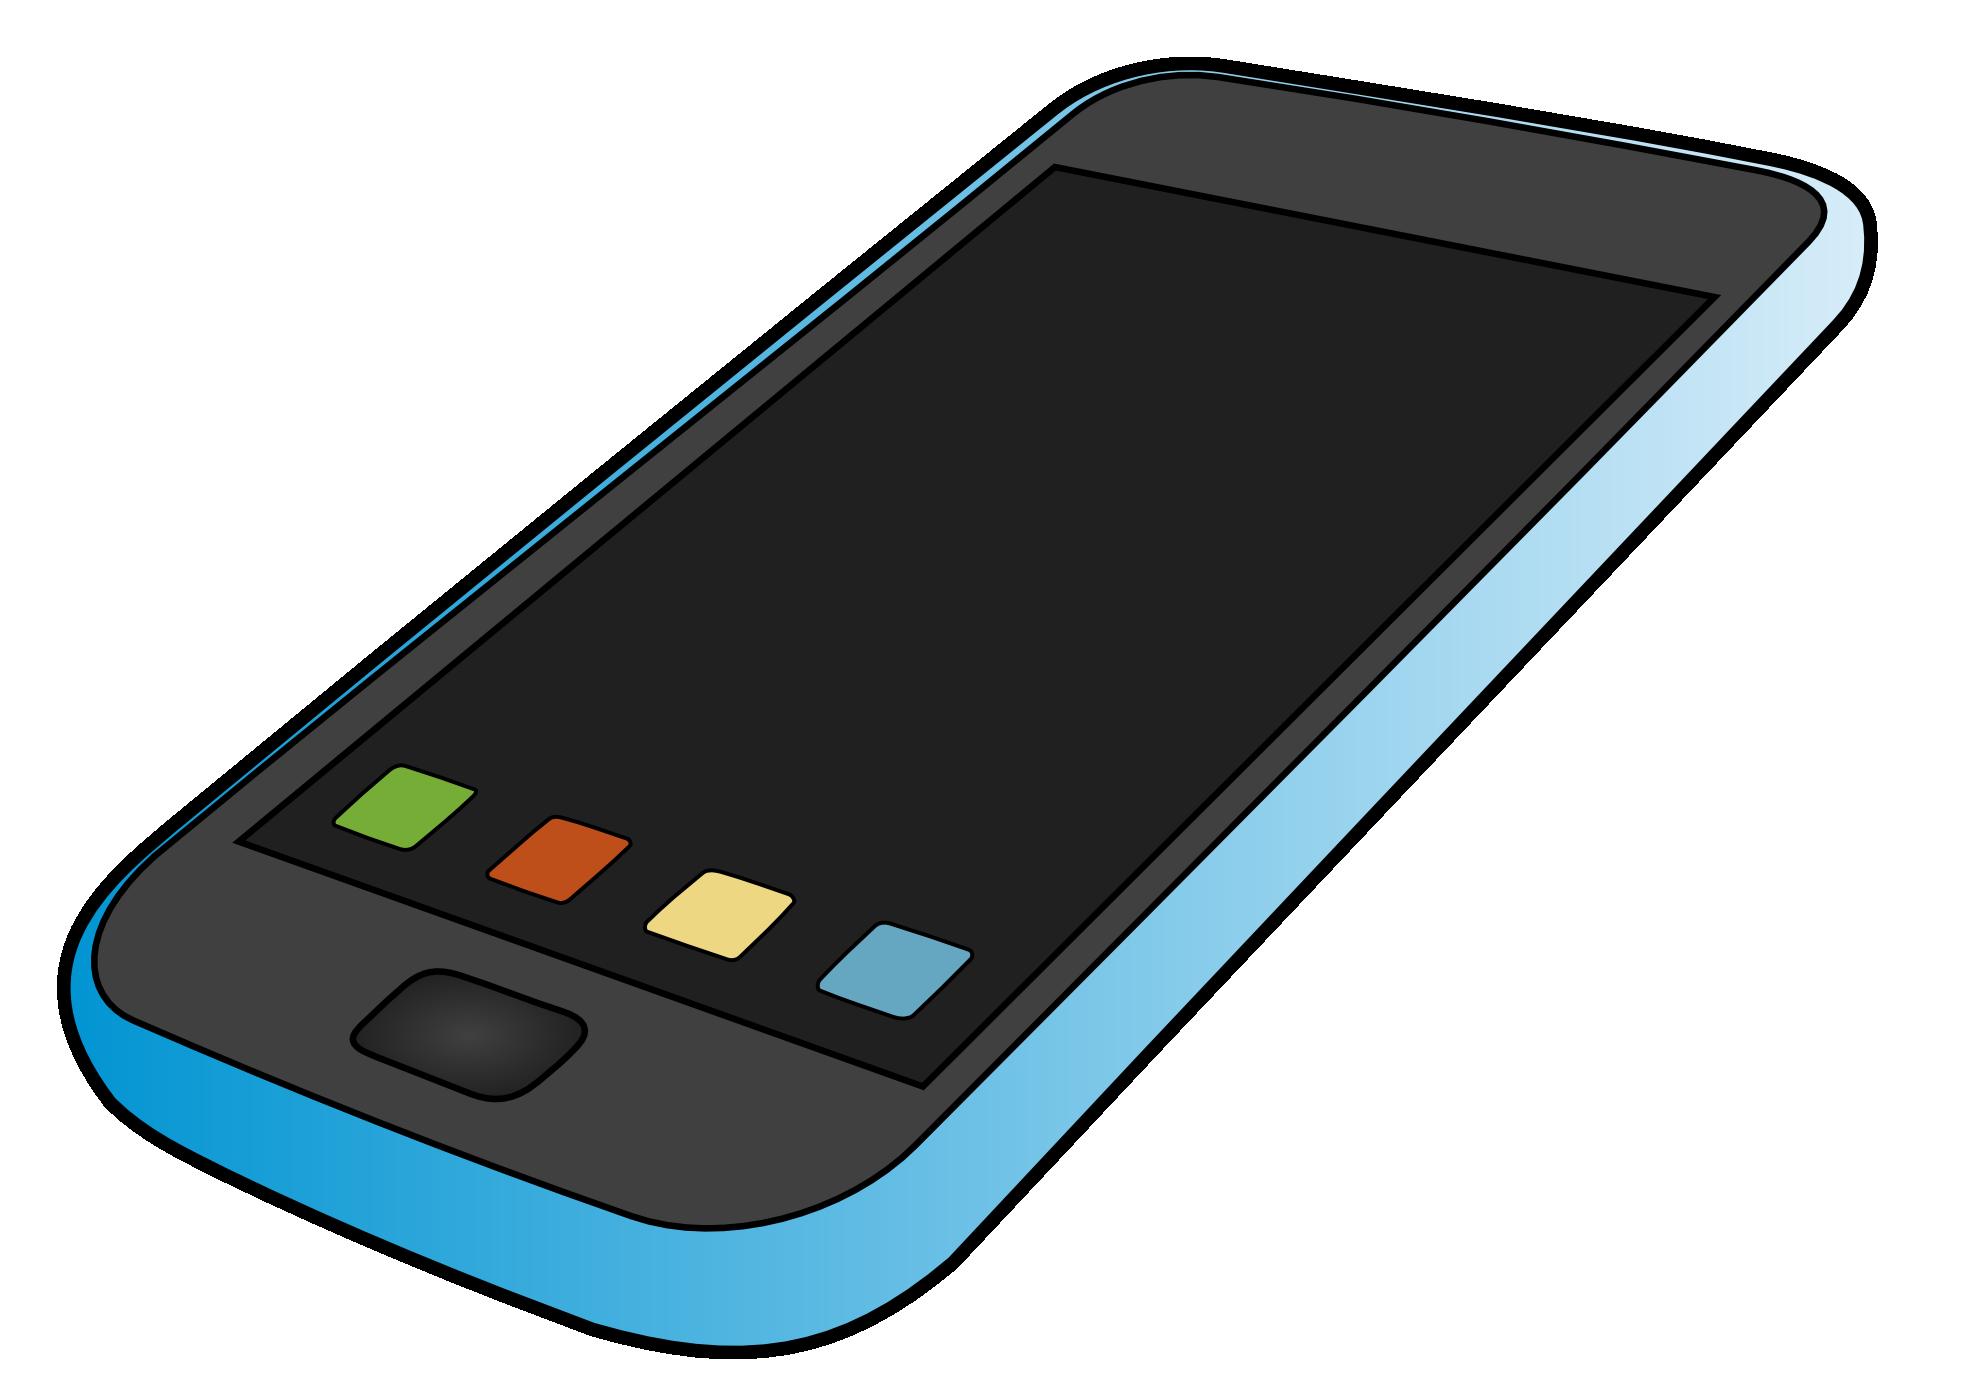 Iphone Cell Phone Clipart-iphone cell phone clipart-11